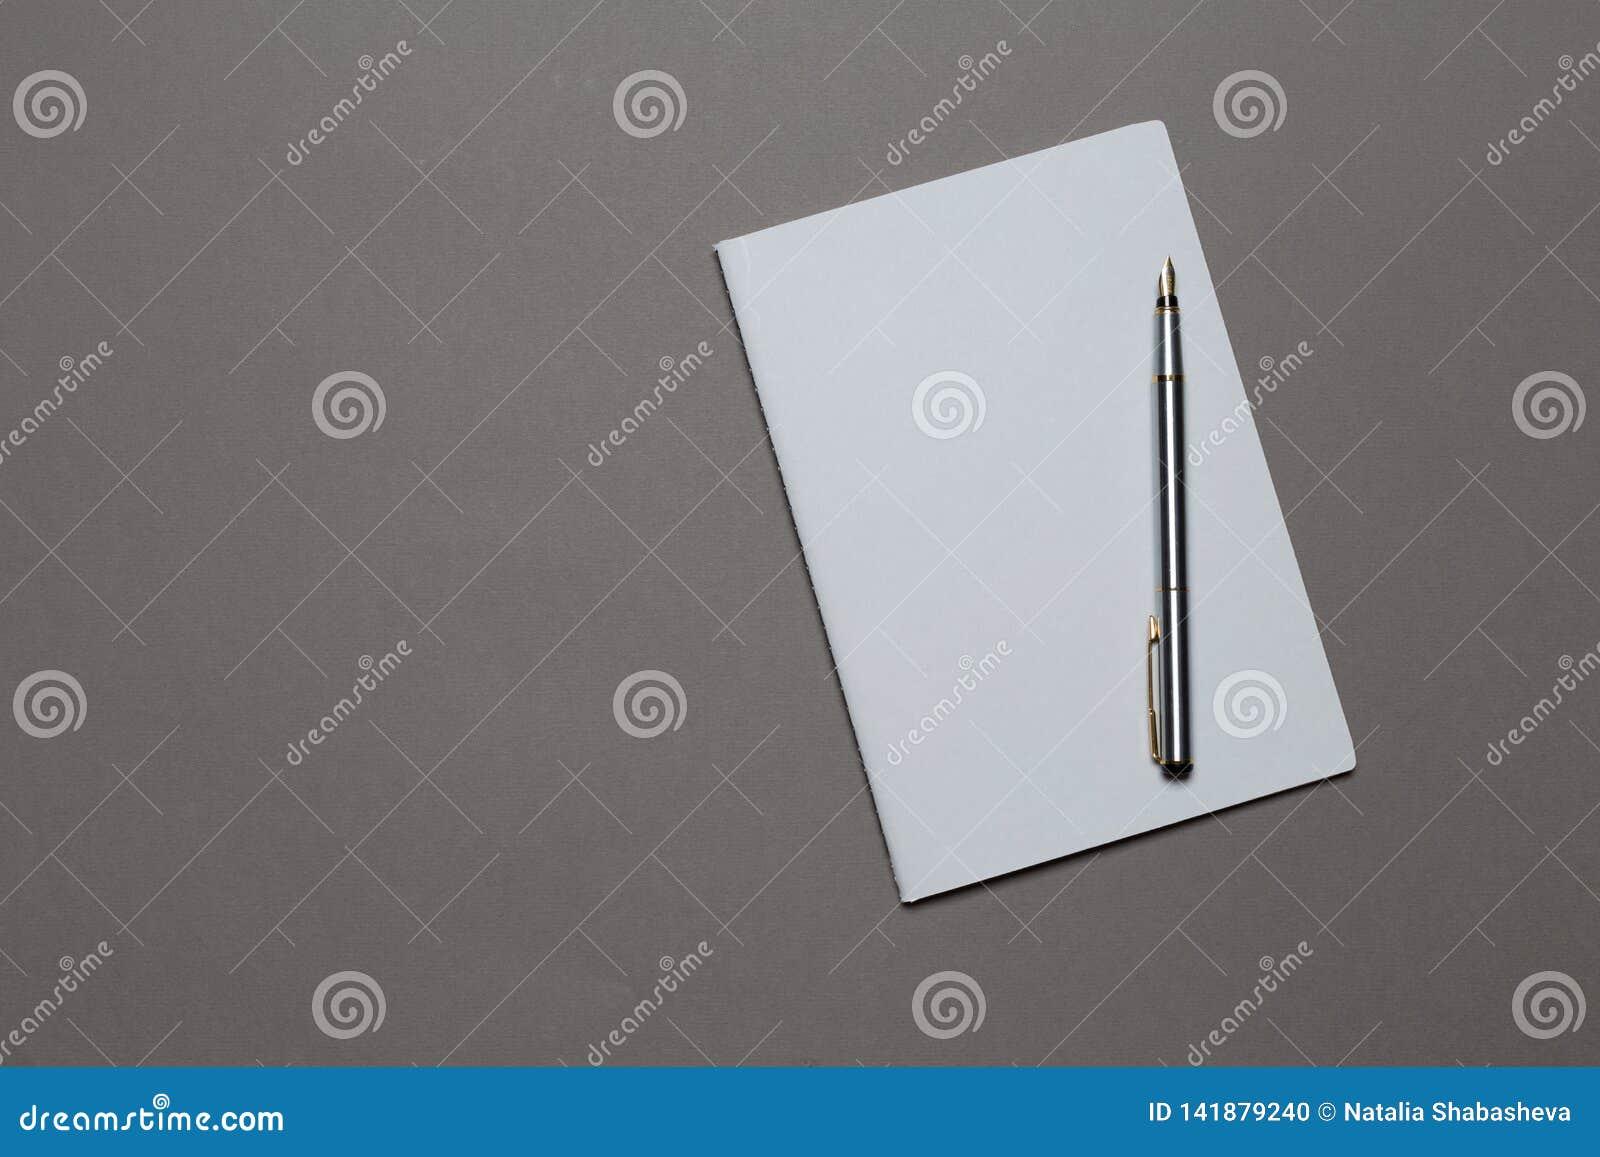 Open office notepad free installation mac